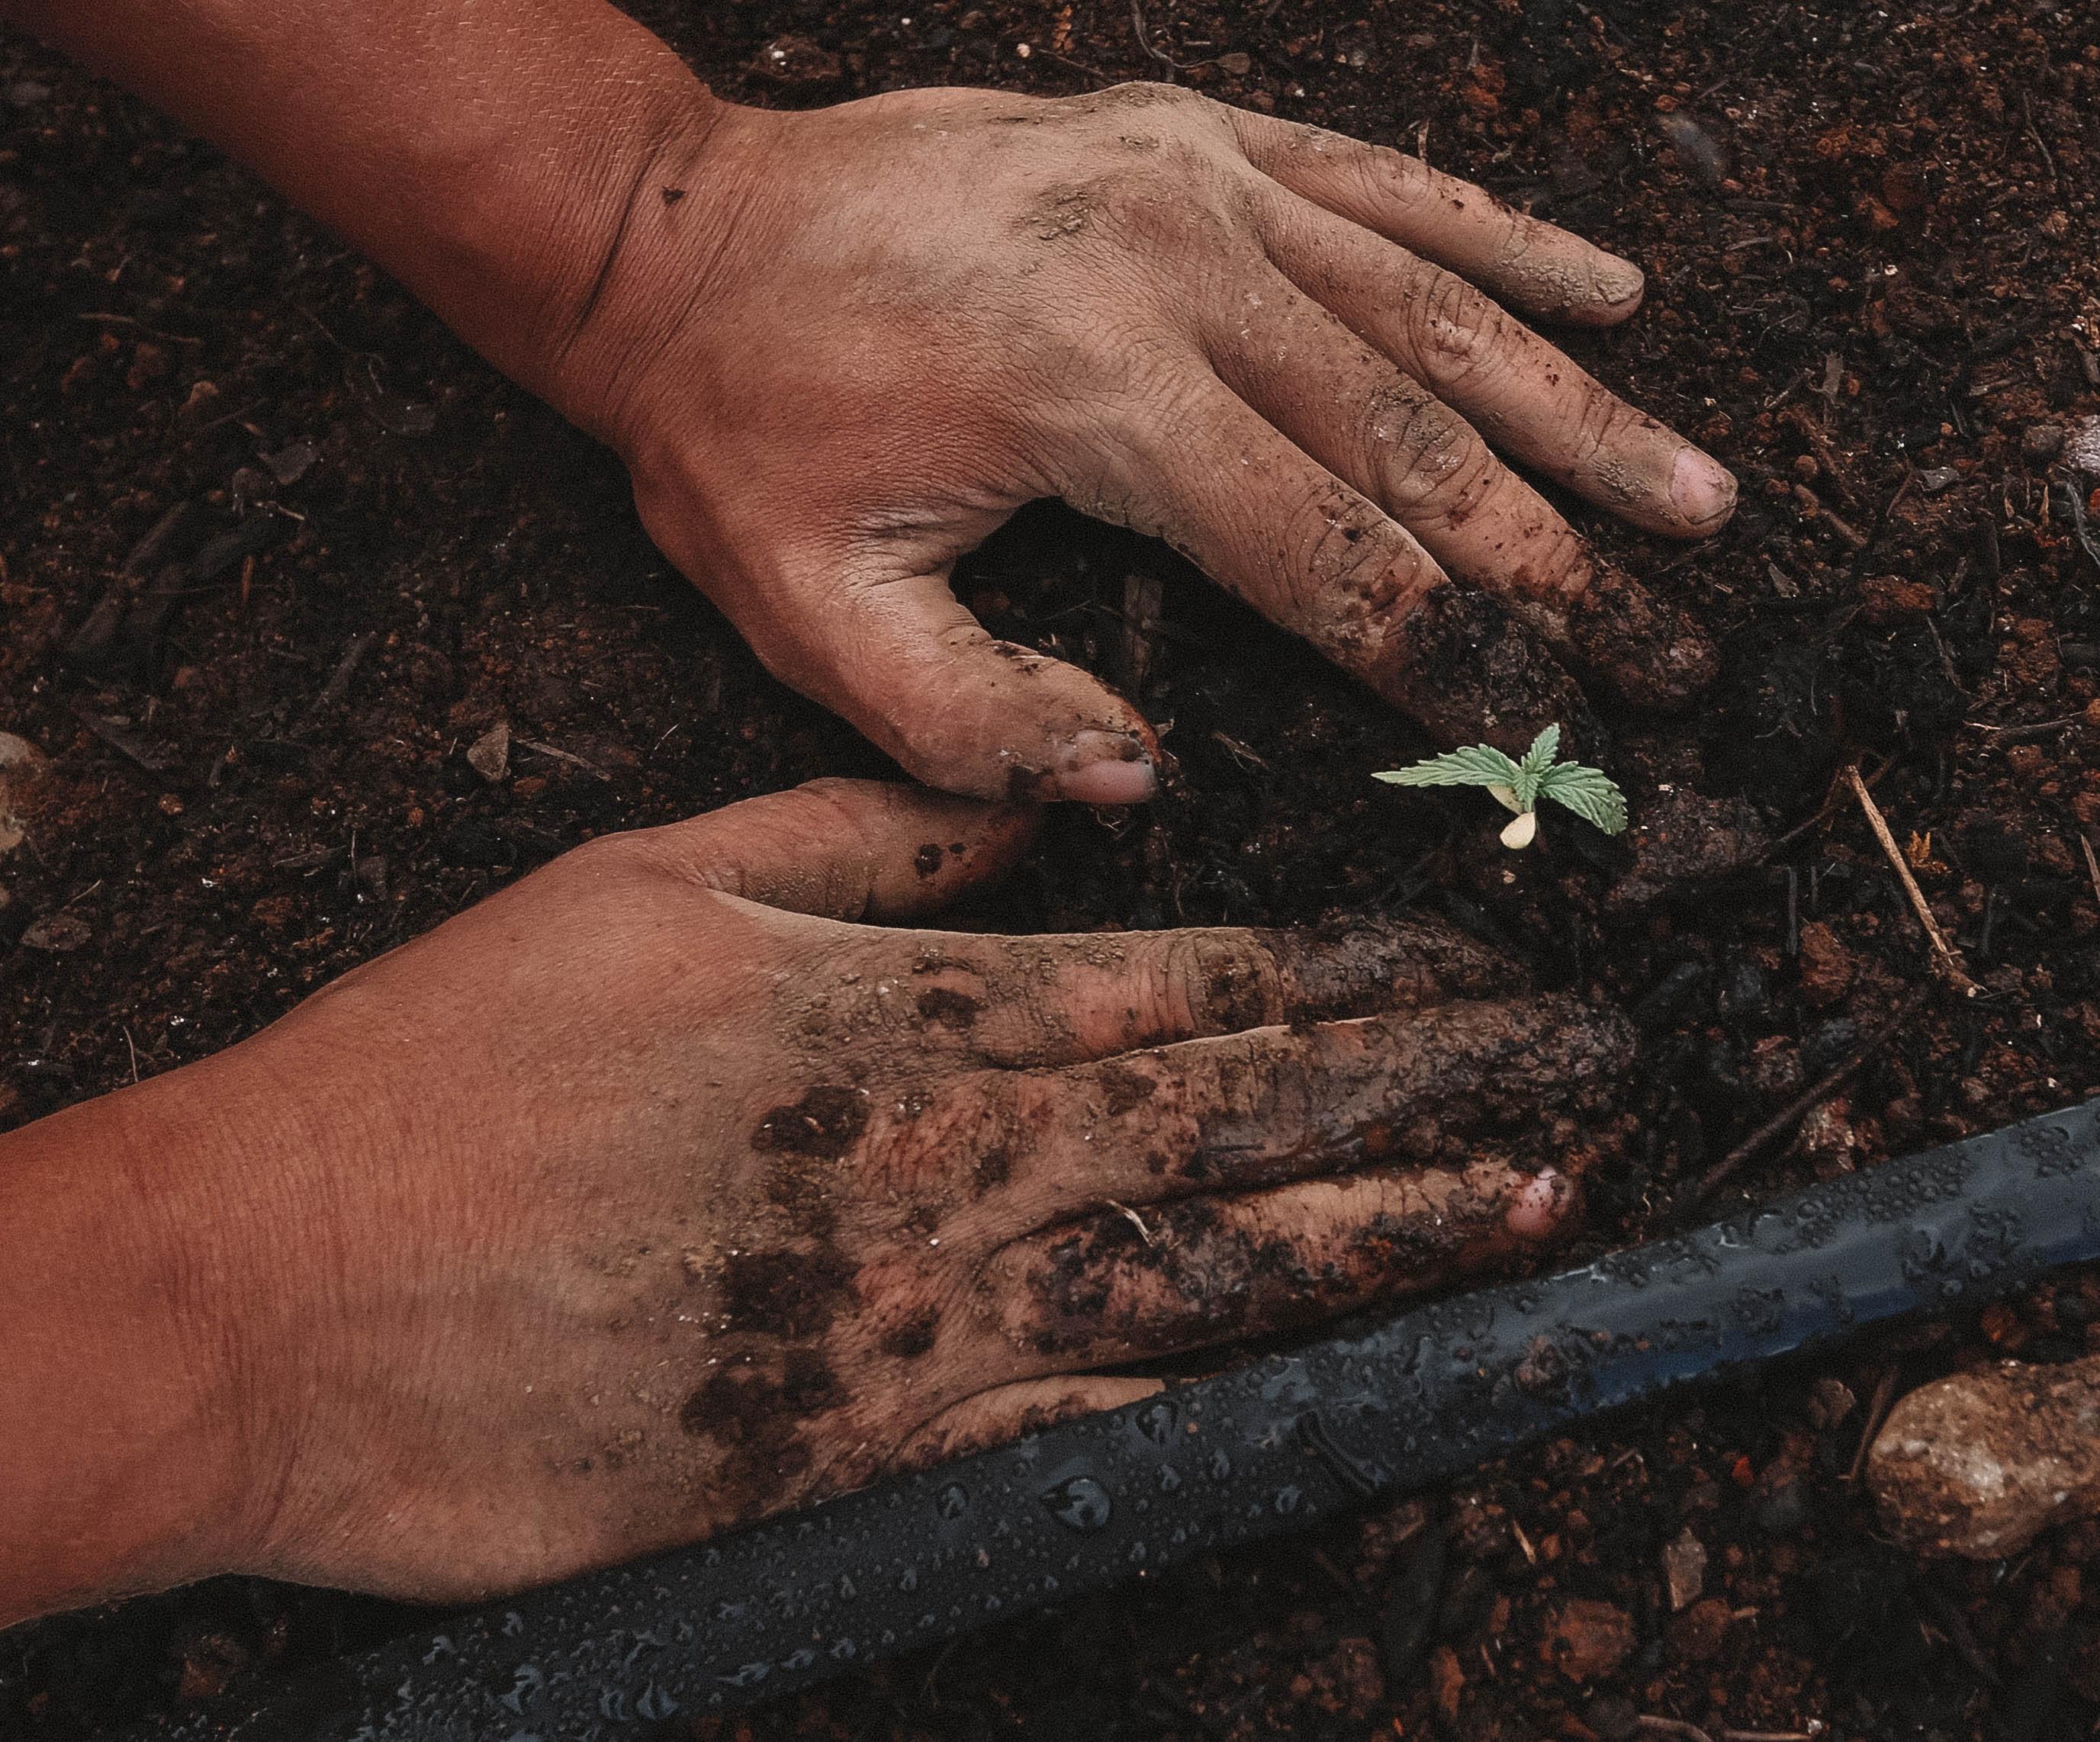 growing produce demands